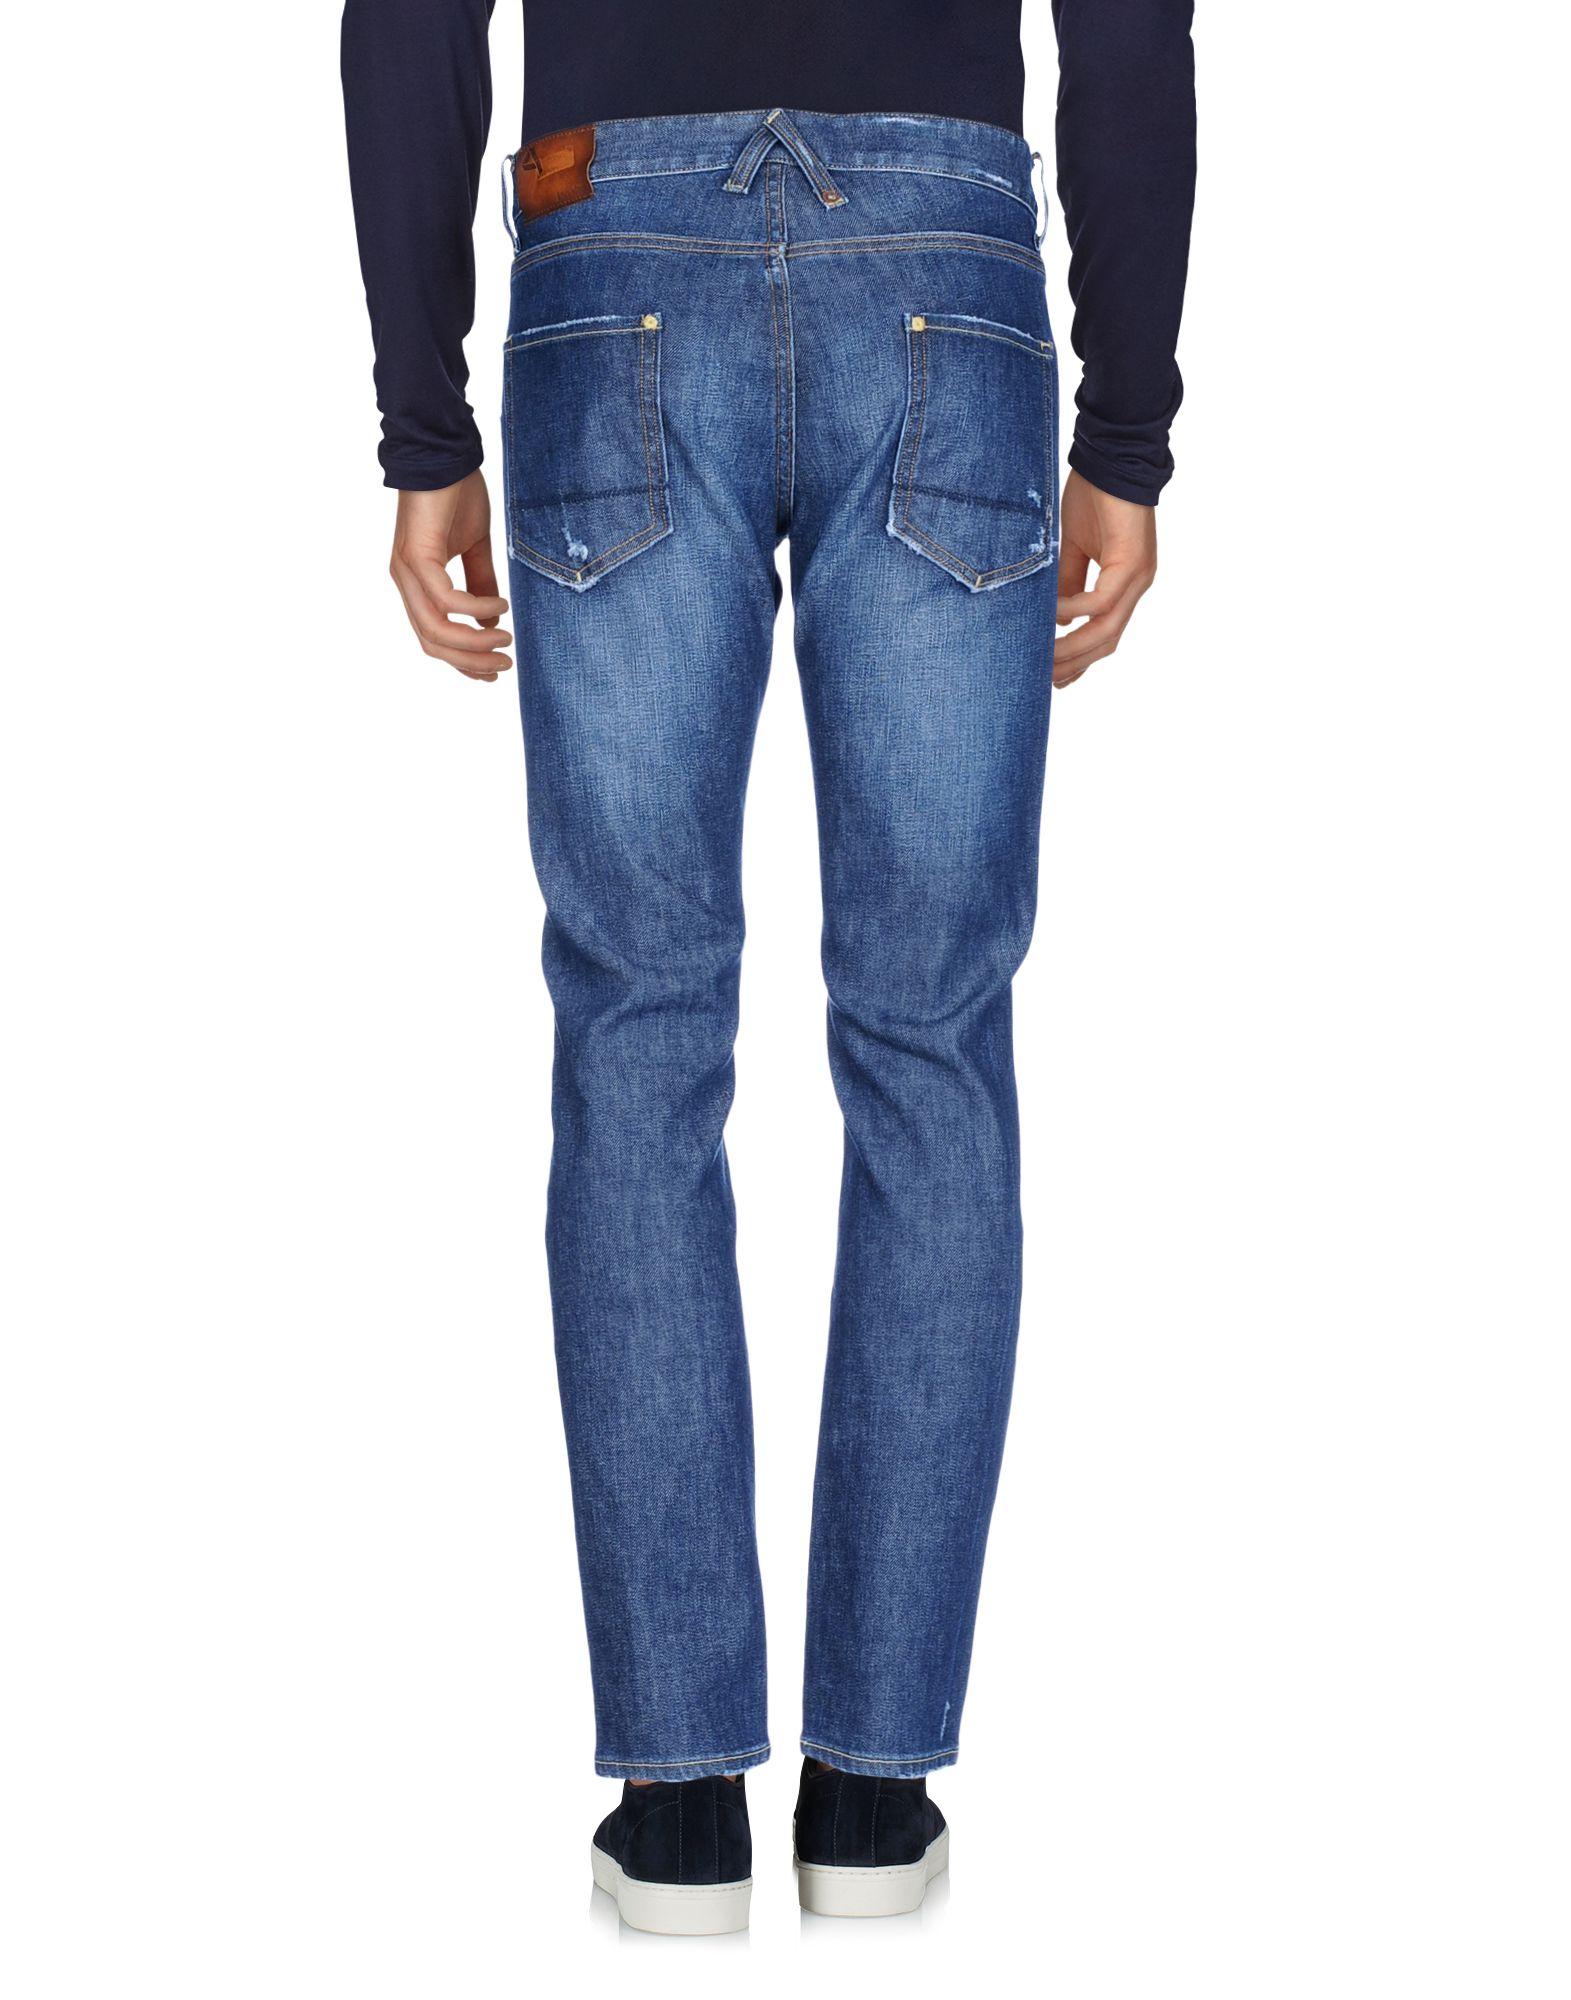 Pantaloni 42681819KA Jeans Cycle Uomo - 42681819KA Pantaloni 5acb5b